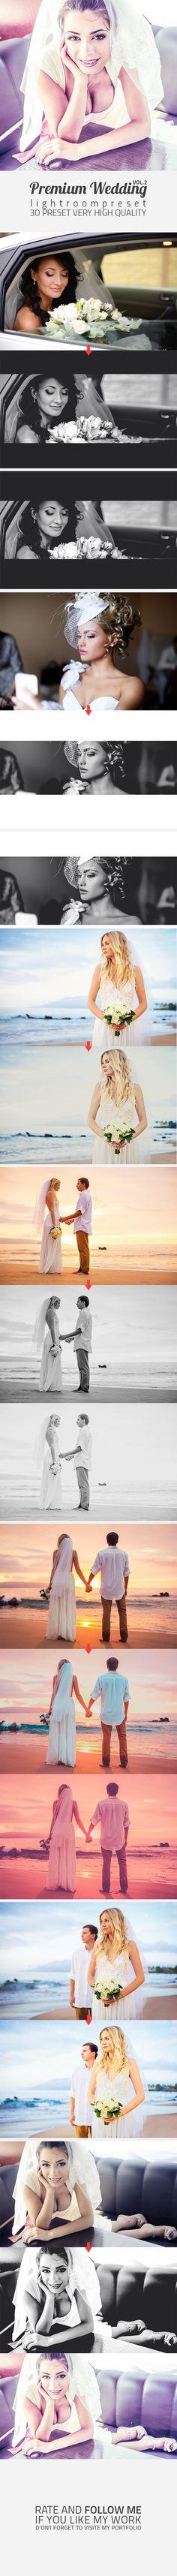 Premium Wedding Preset Vol-2 - Lightroom Presets Add-ons